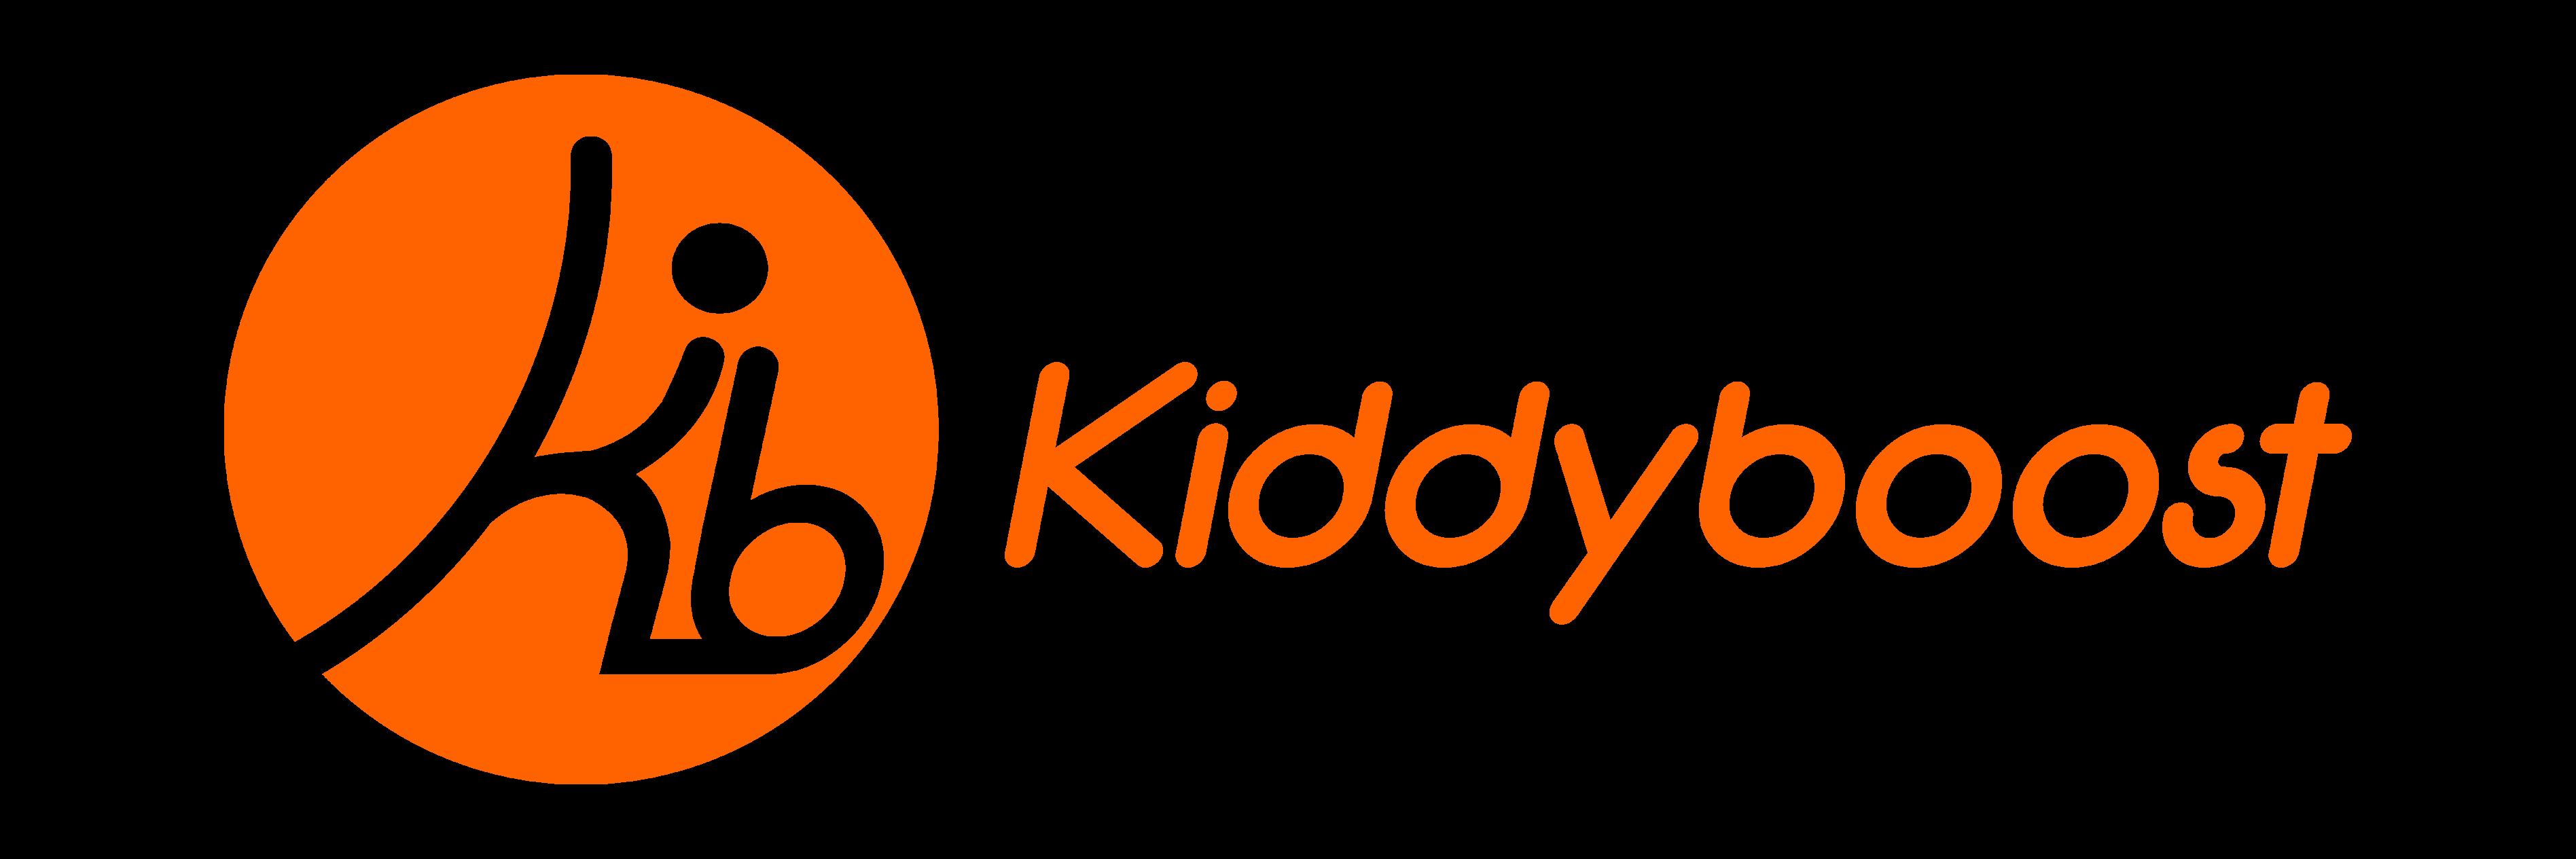 Kiddyboost